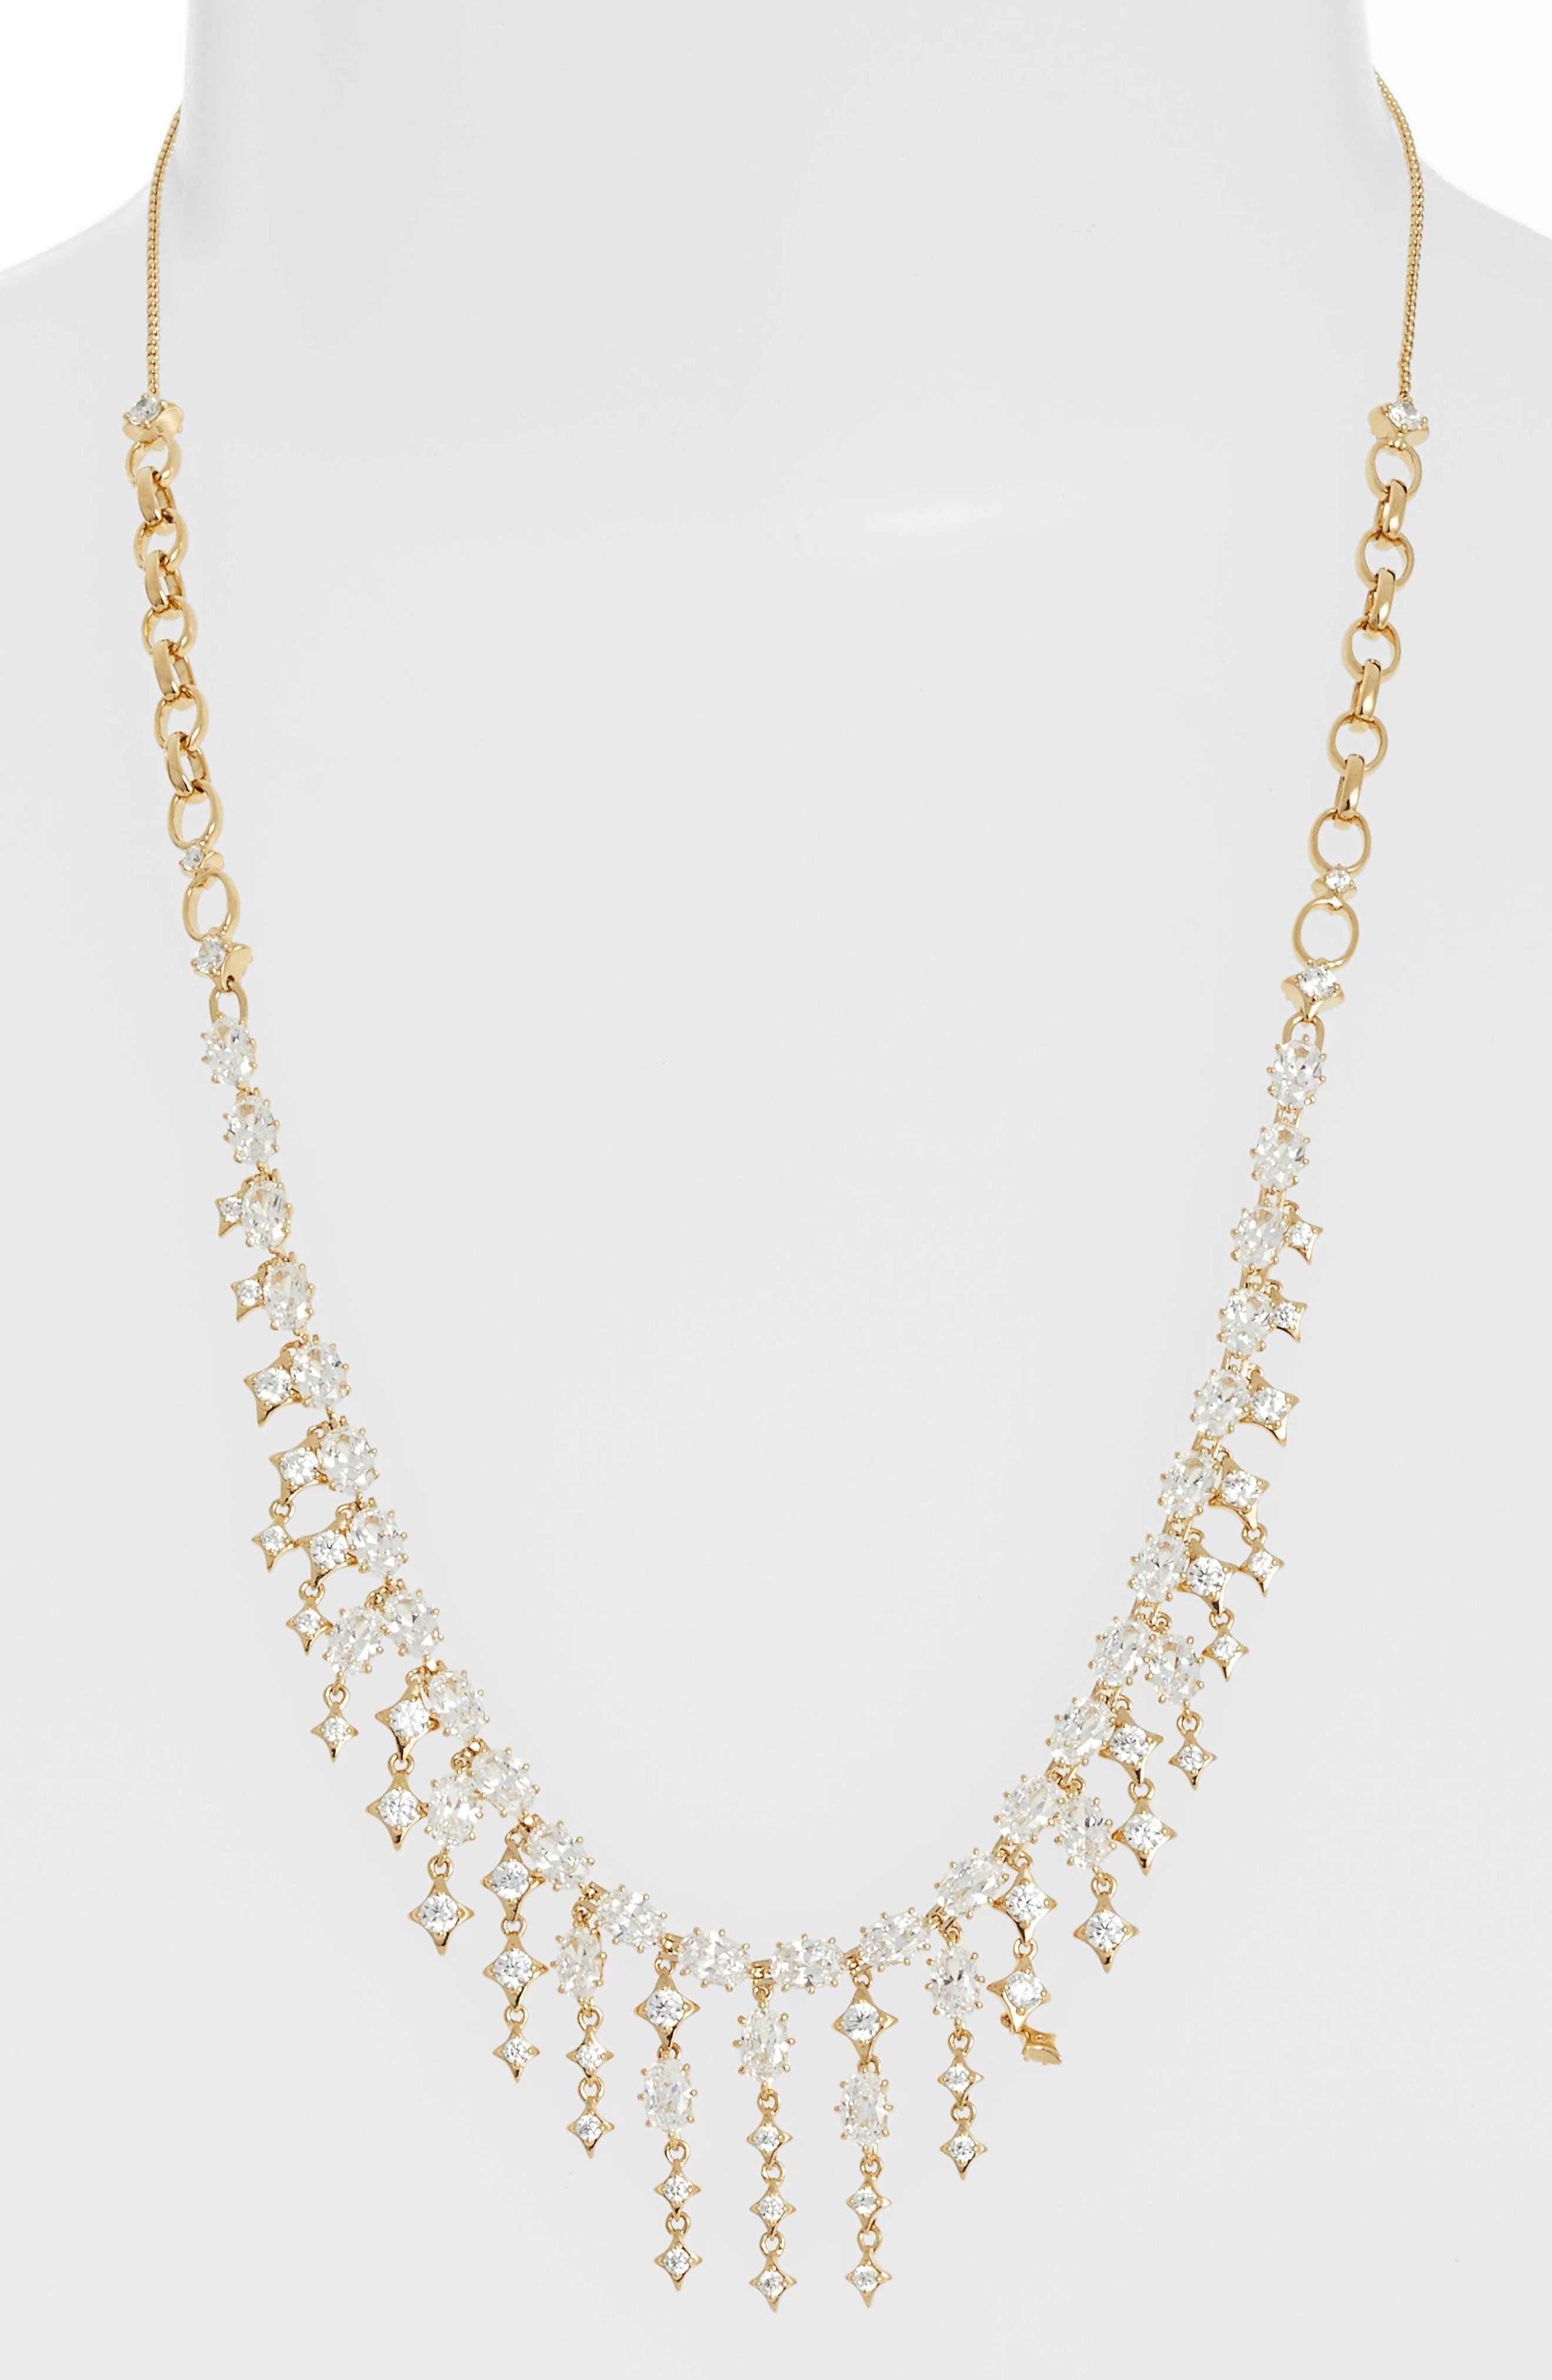 Crystal Fringe Necklace,                         Main,                         color, GOLD/ CLEAR